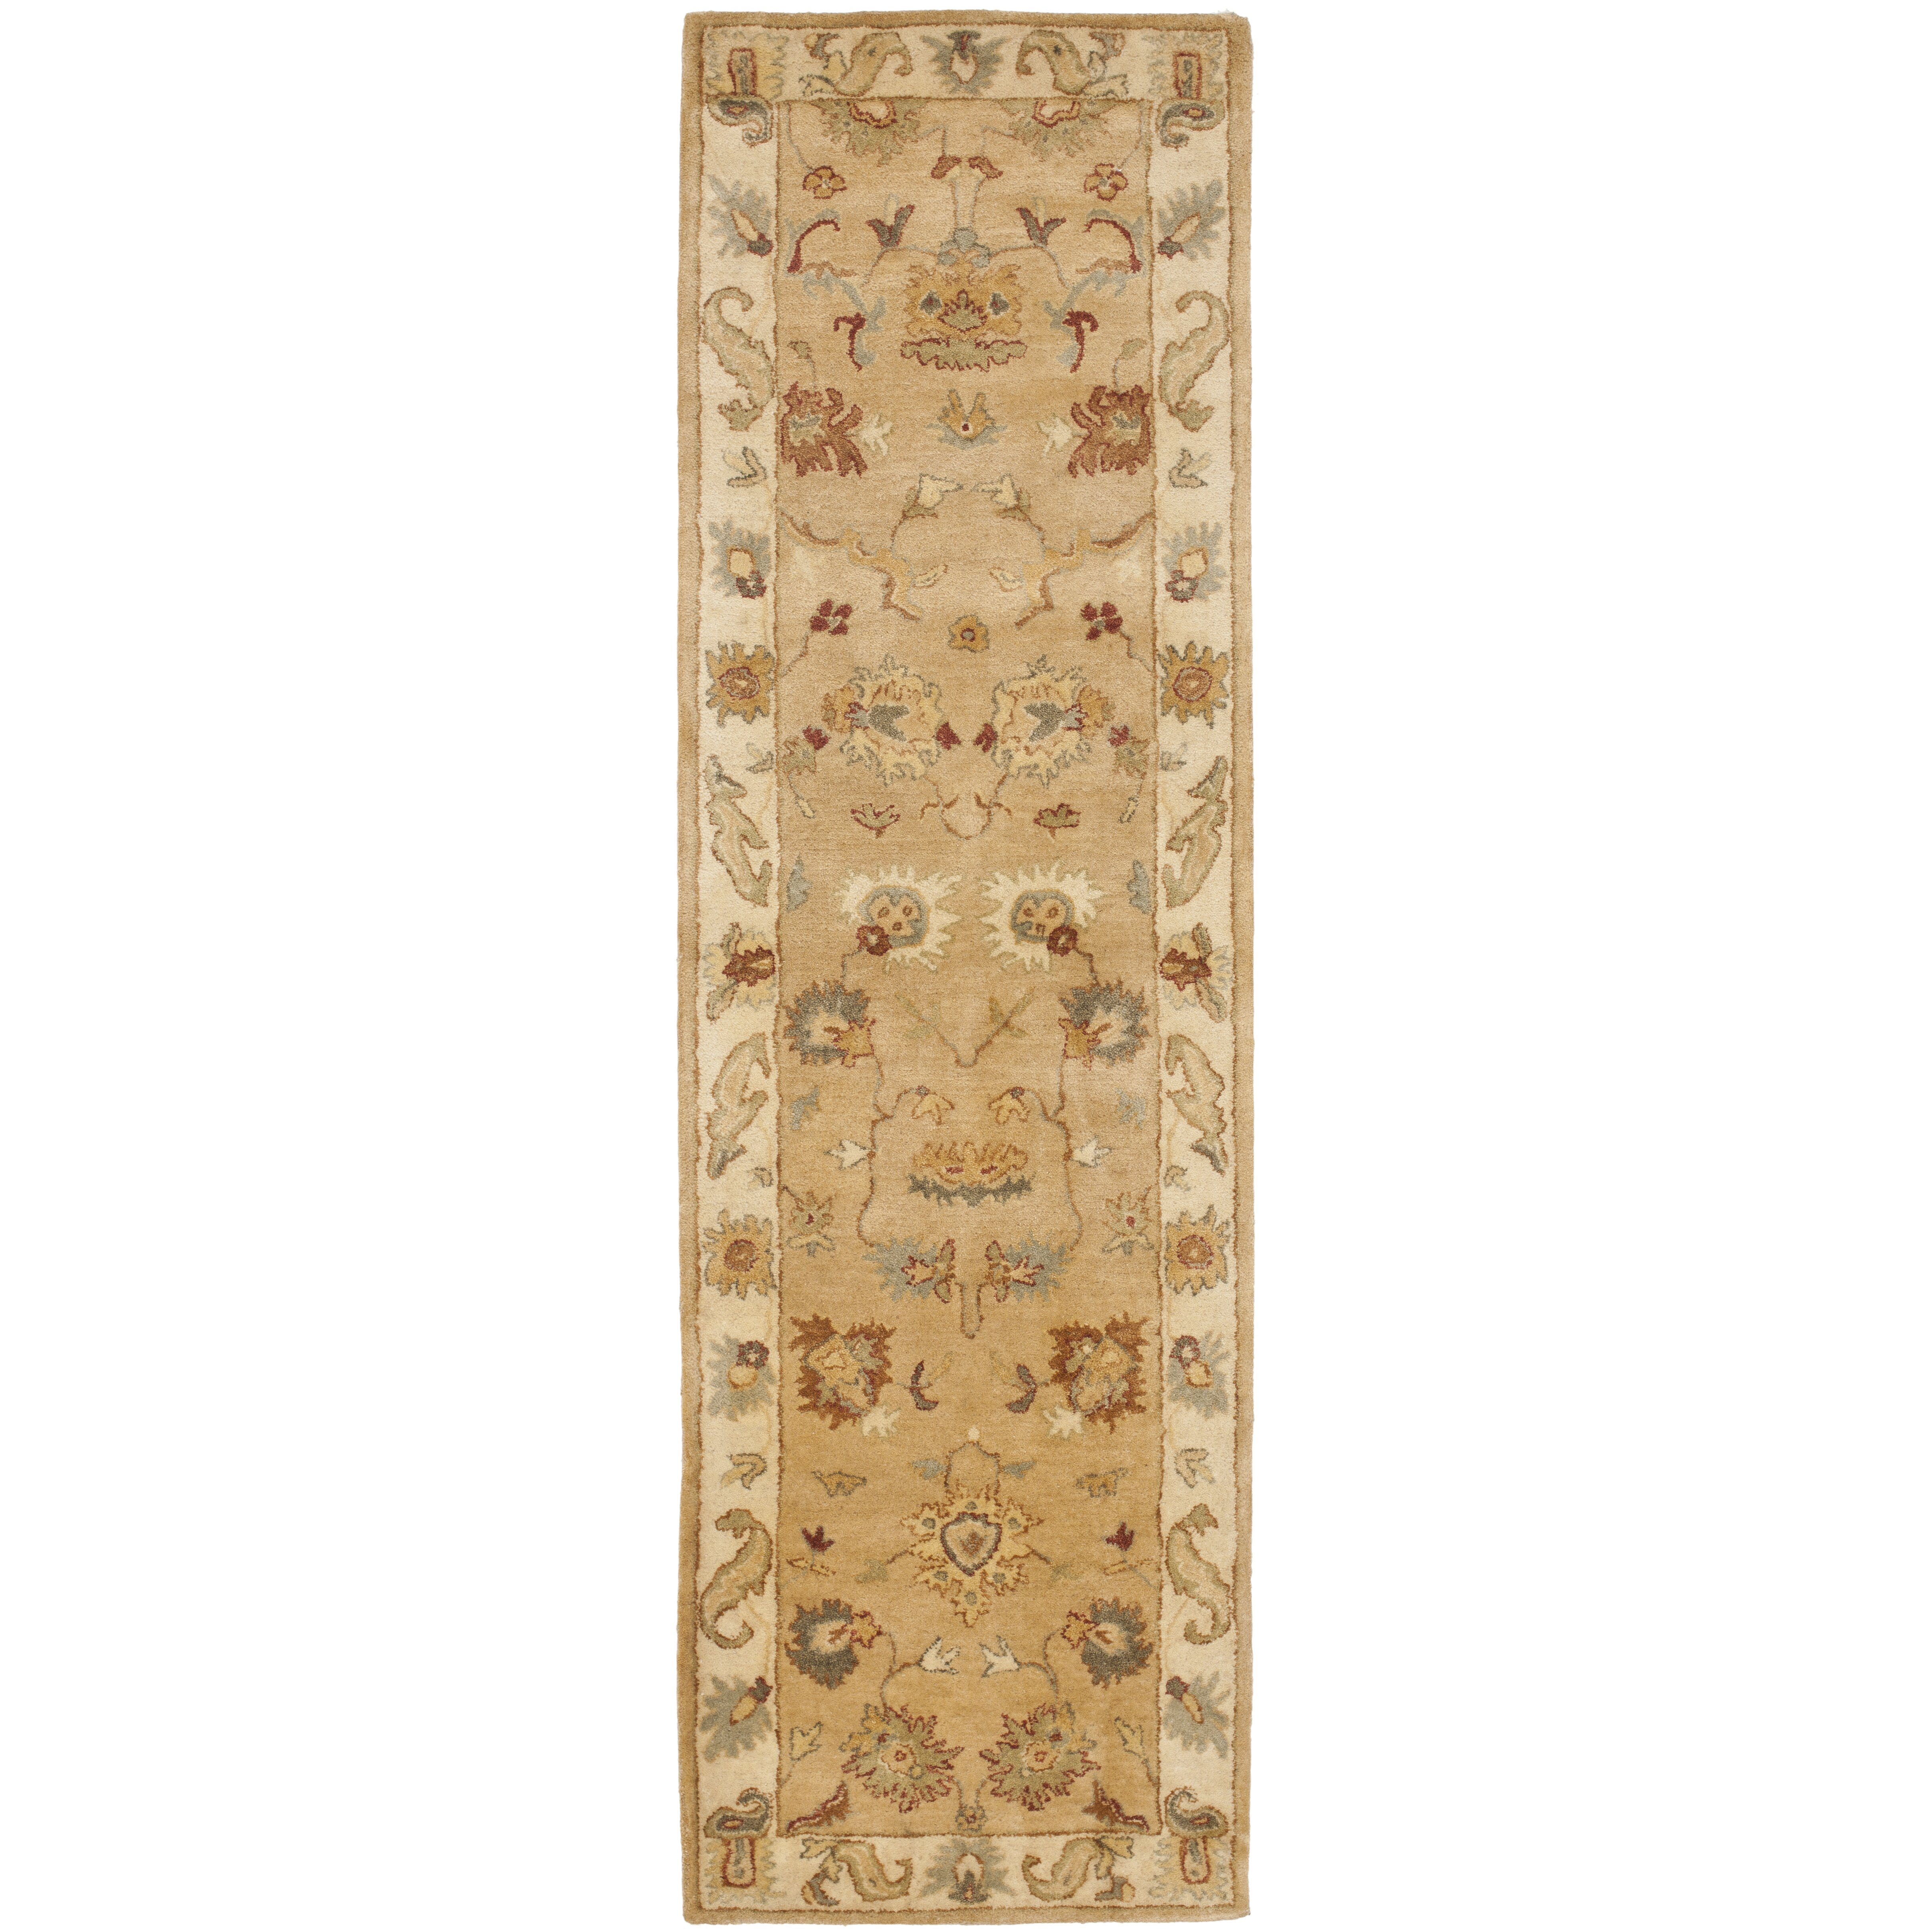 Safavieh bergama area rug wayfair for Safavieh rugs